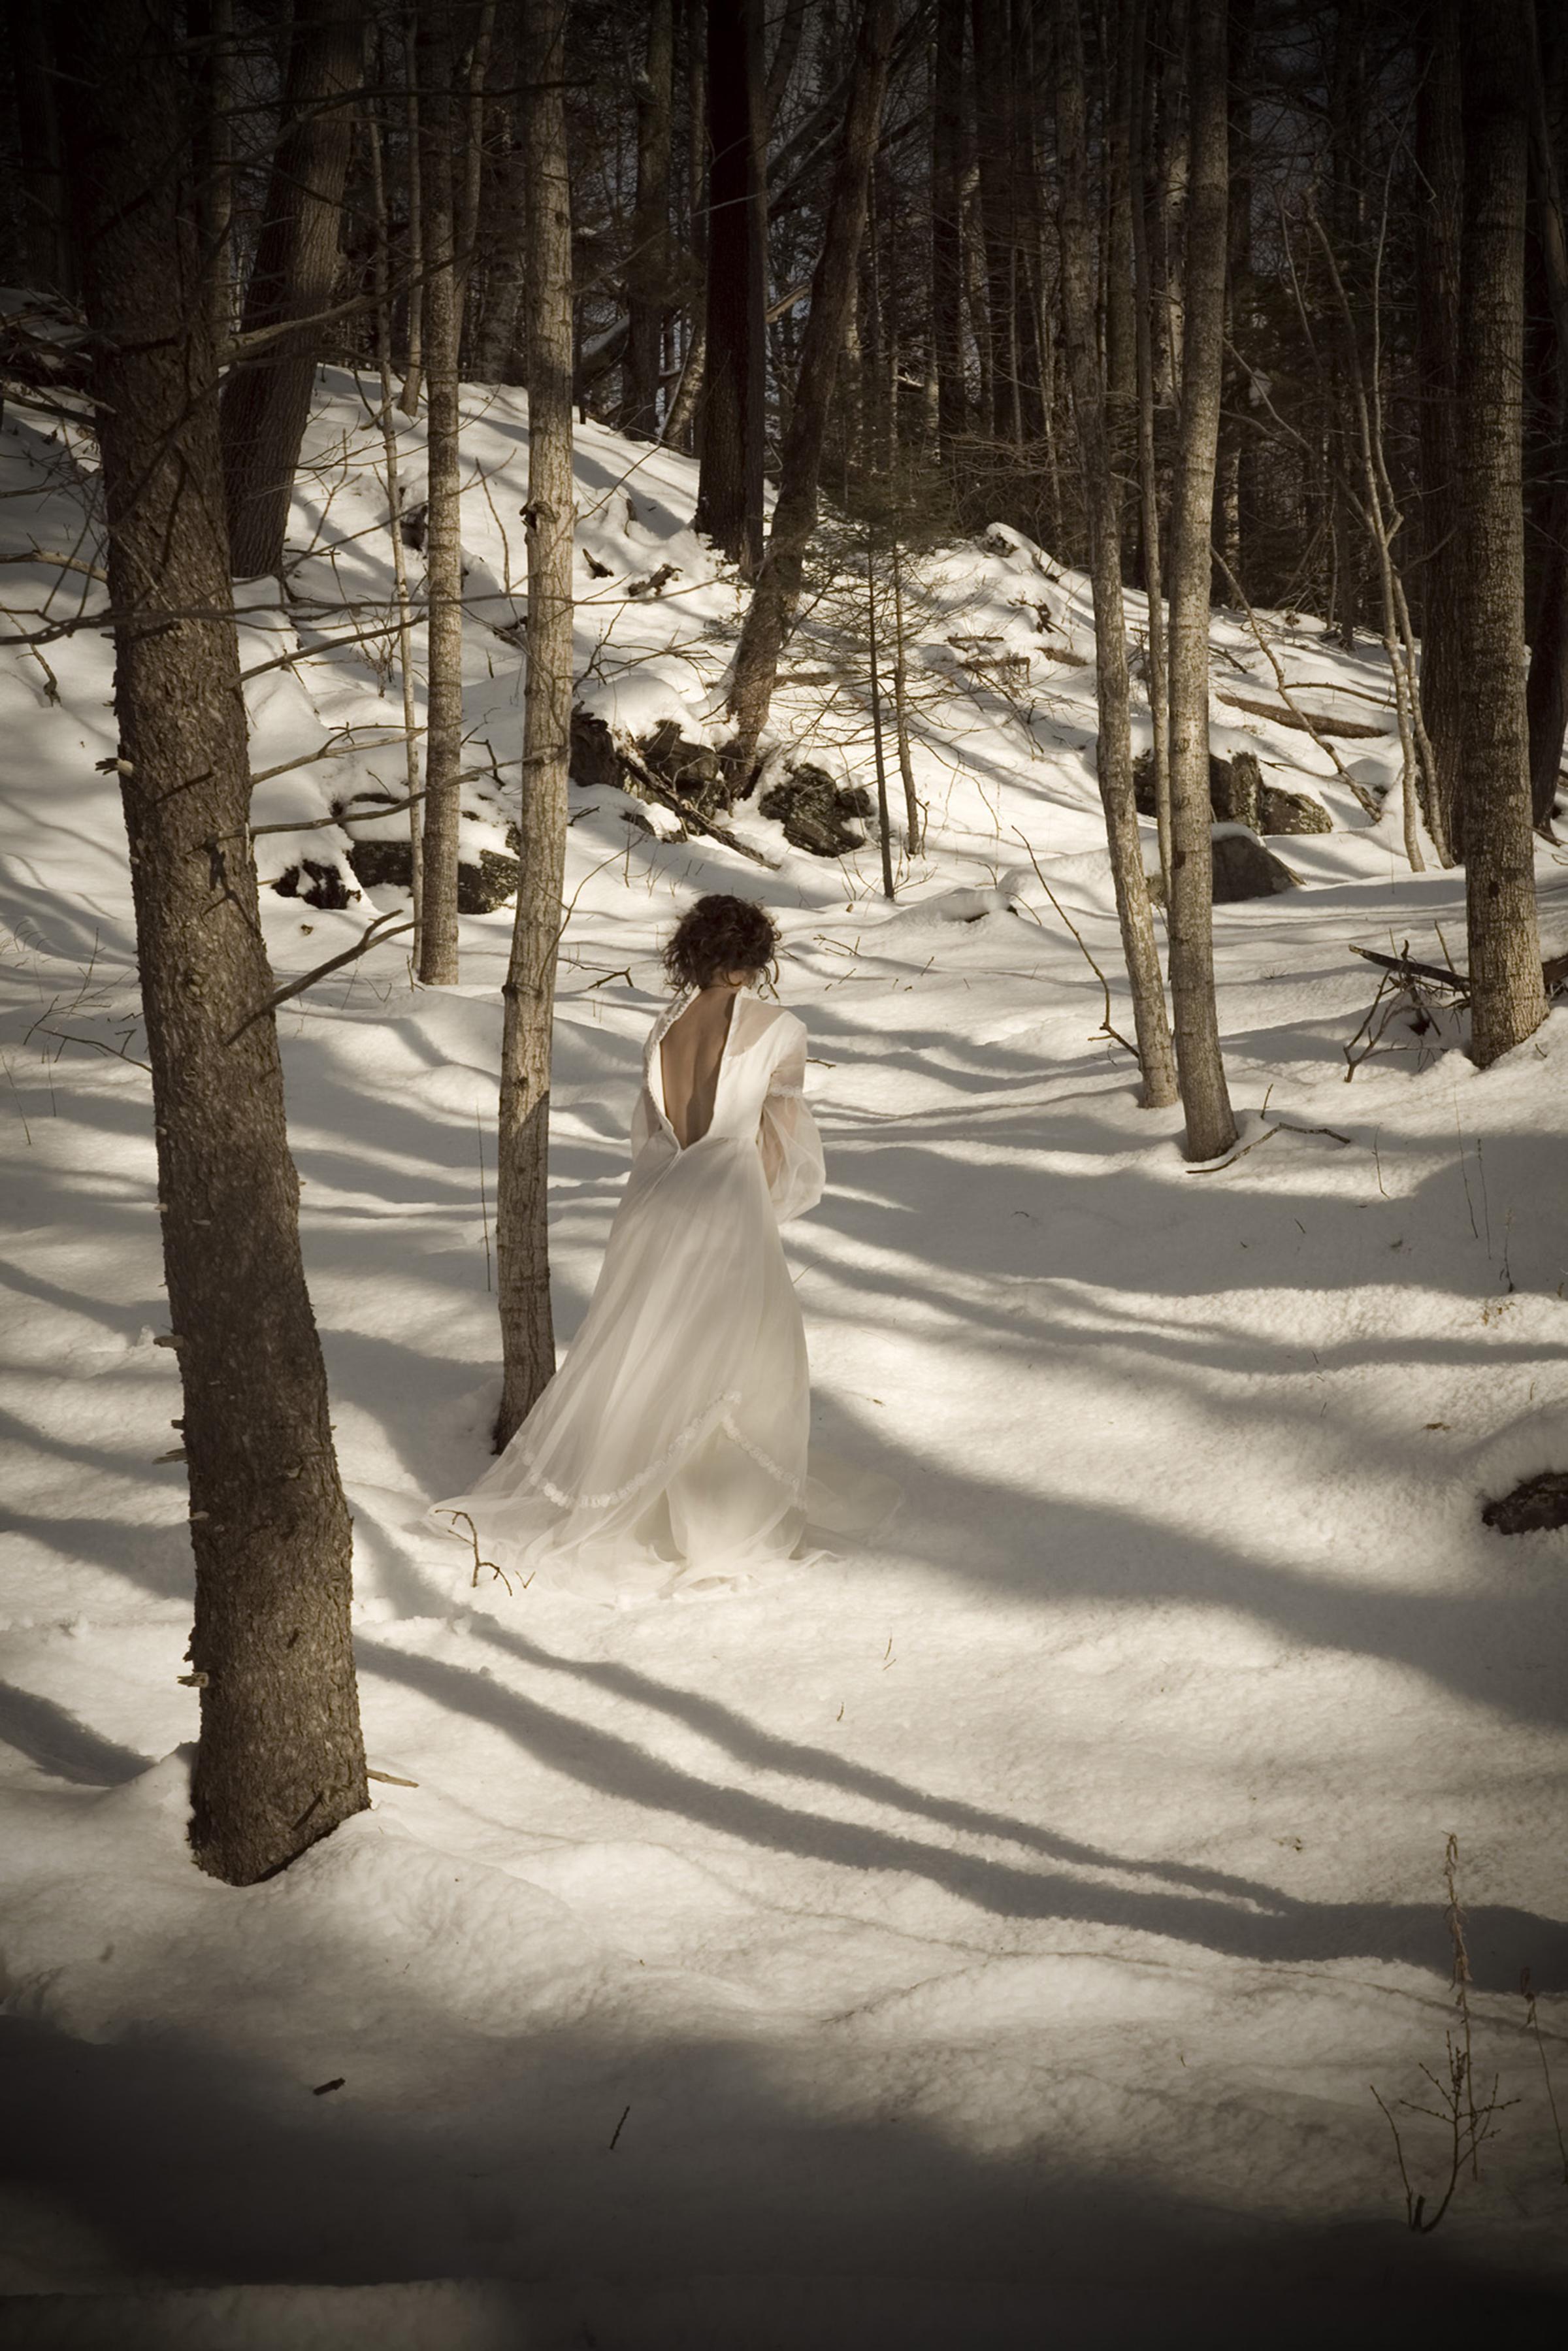 selfport_clairerosen_snowwings.jpg